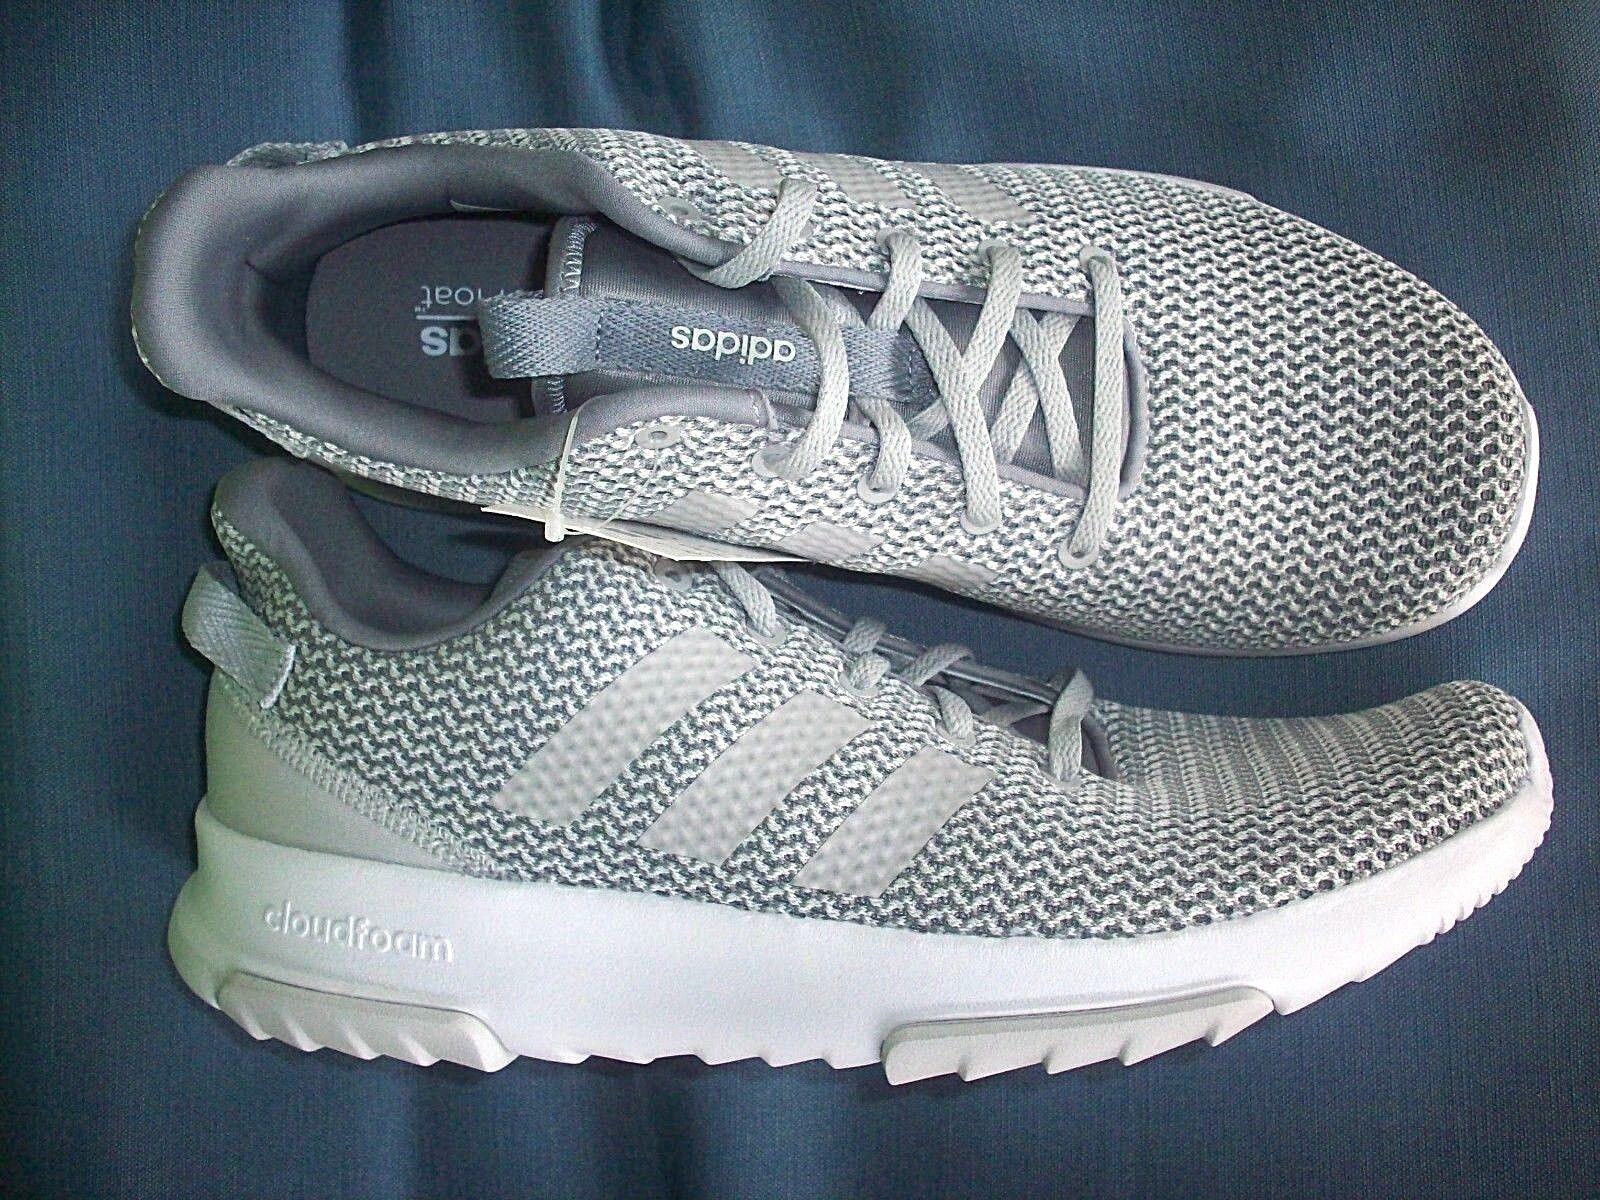 Adidas mens sneaker 9.5 US